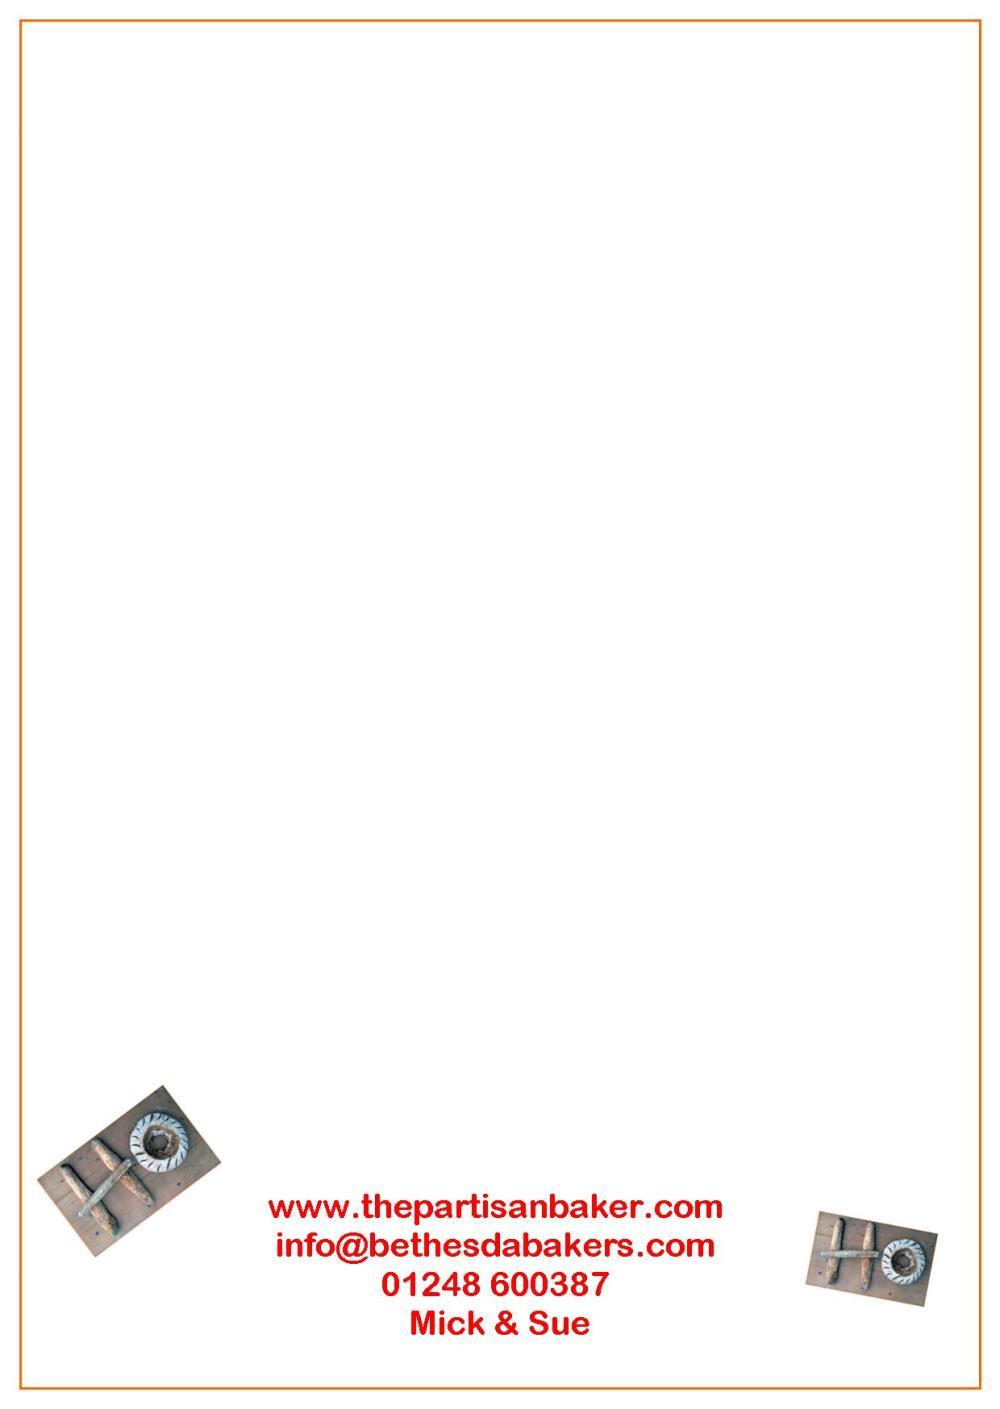 card 2 border